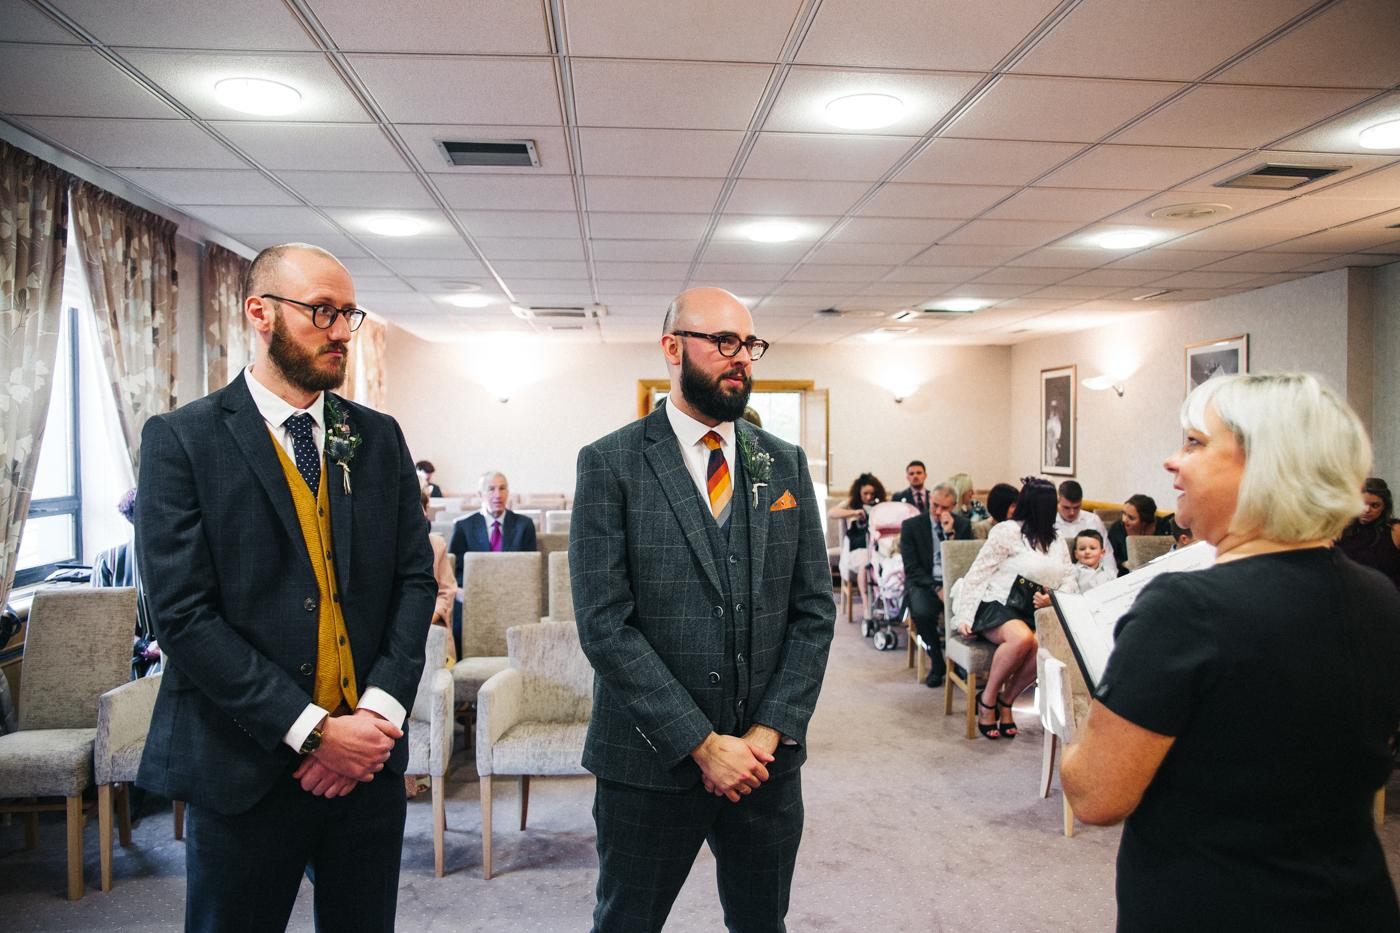 teesside-newcastle-gateshead-wedding-photography-photographer-creative-0032.jpg